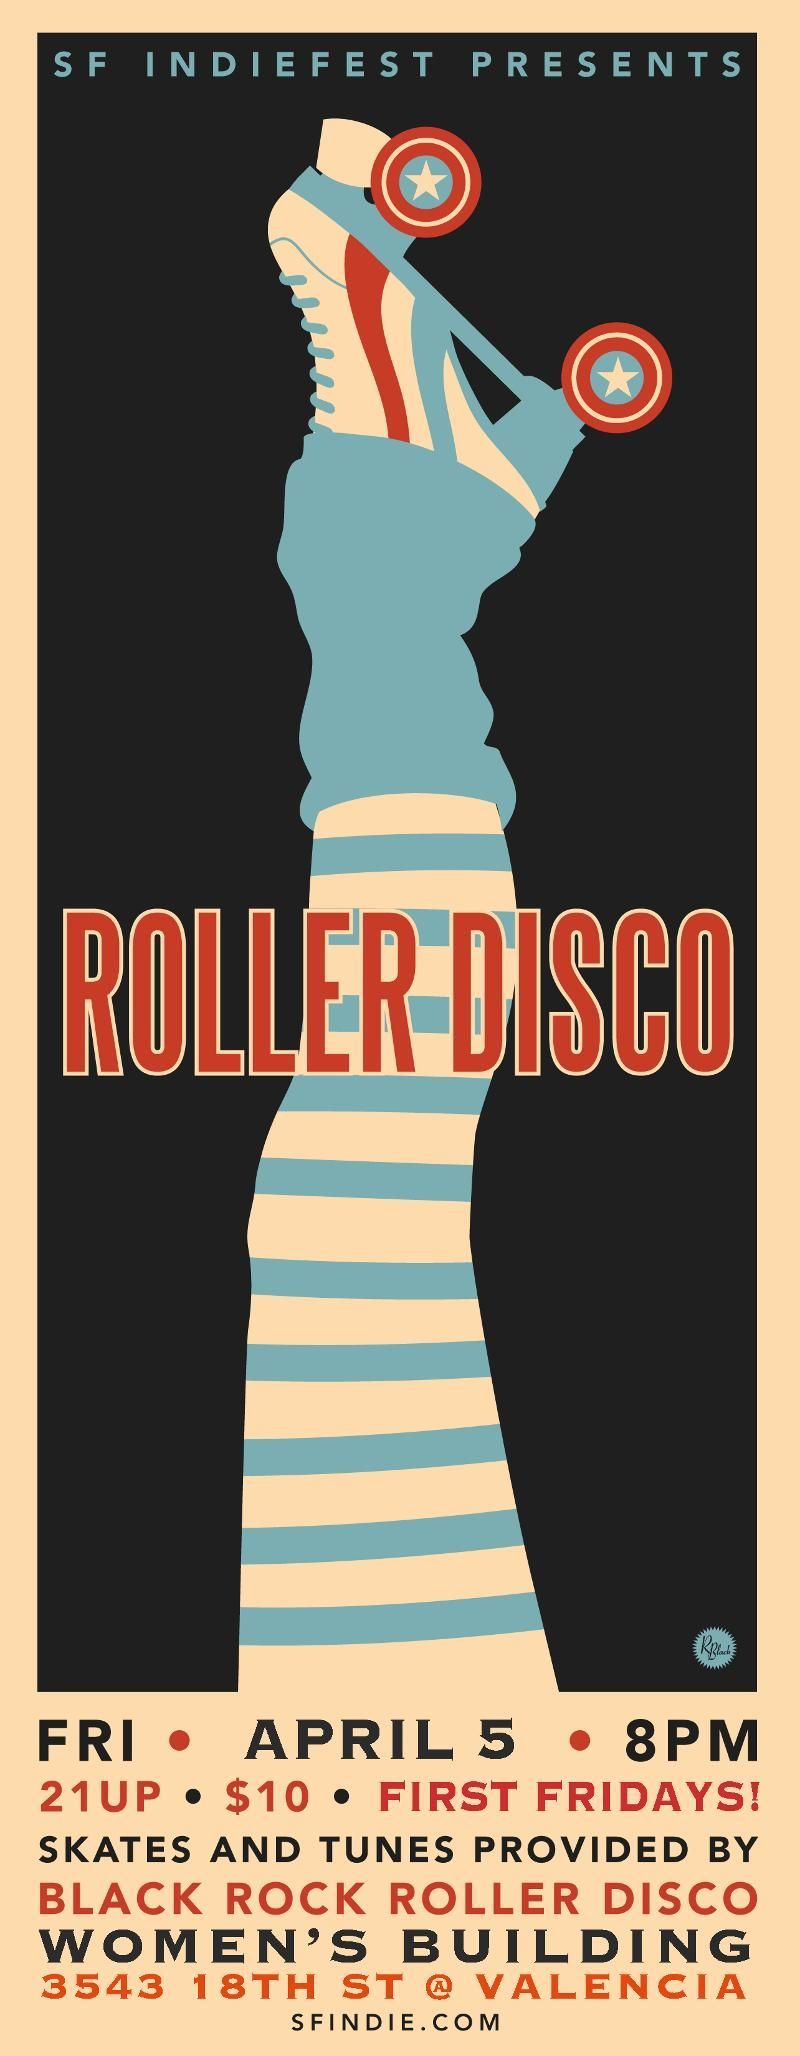 roller disco speed dating